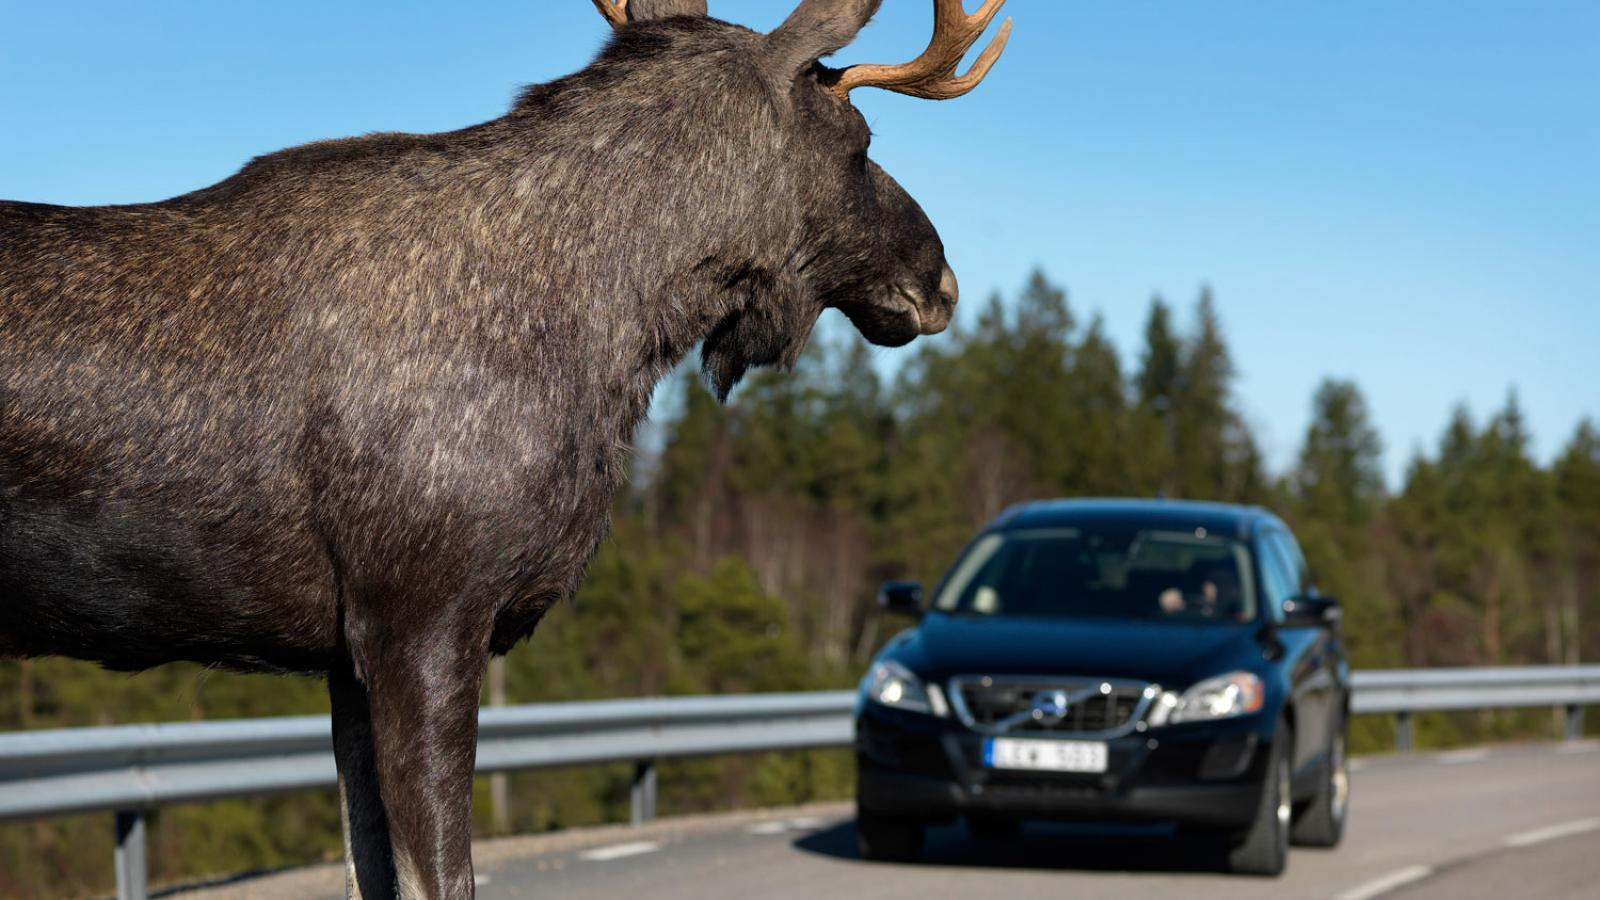 Водителей предупреждают об активизации лосей